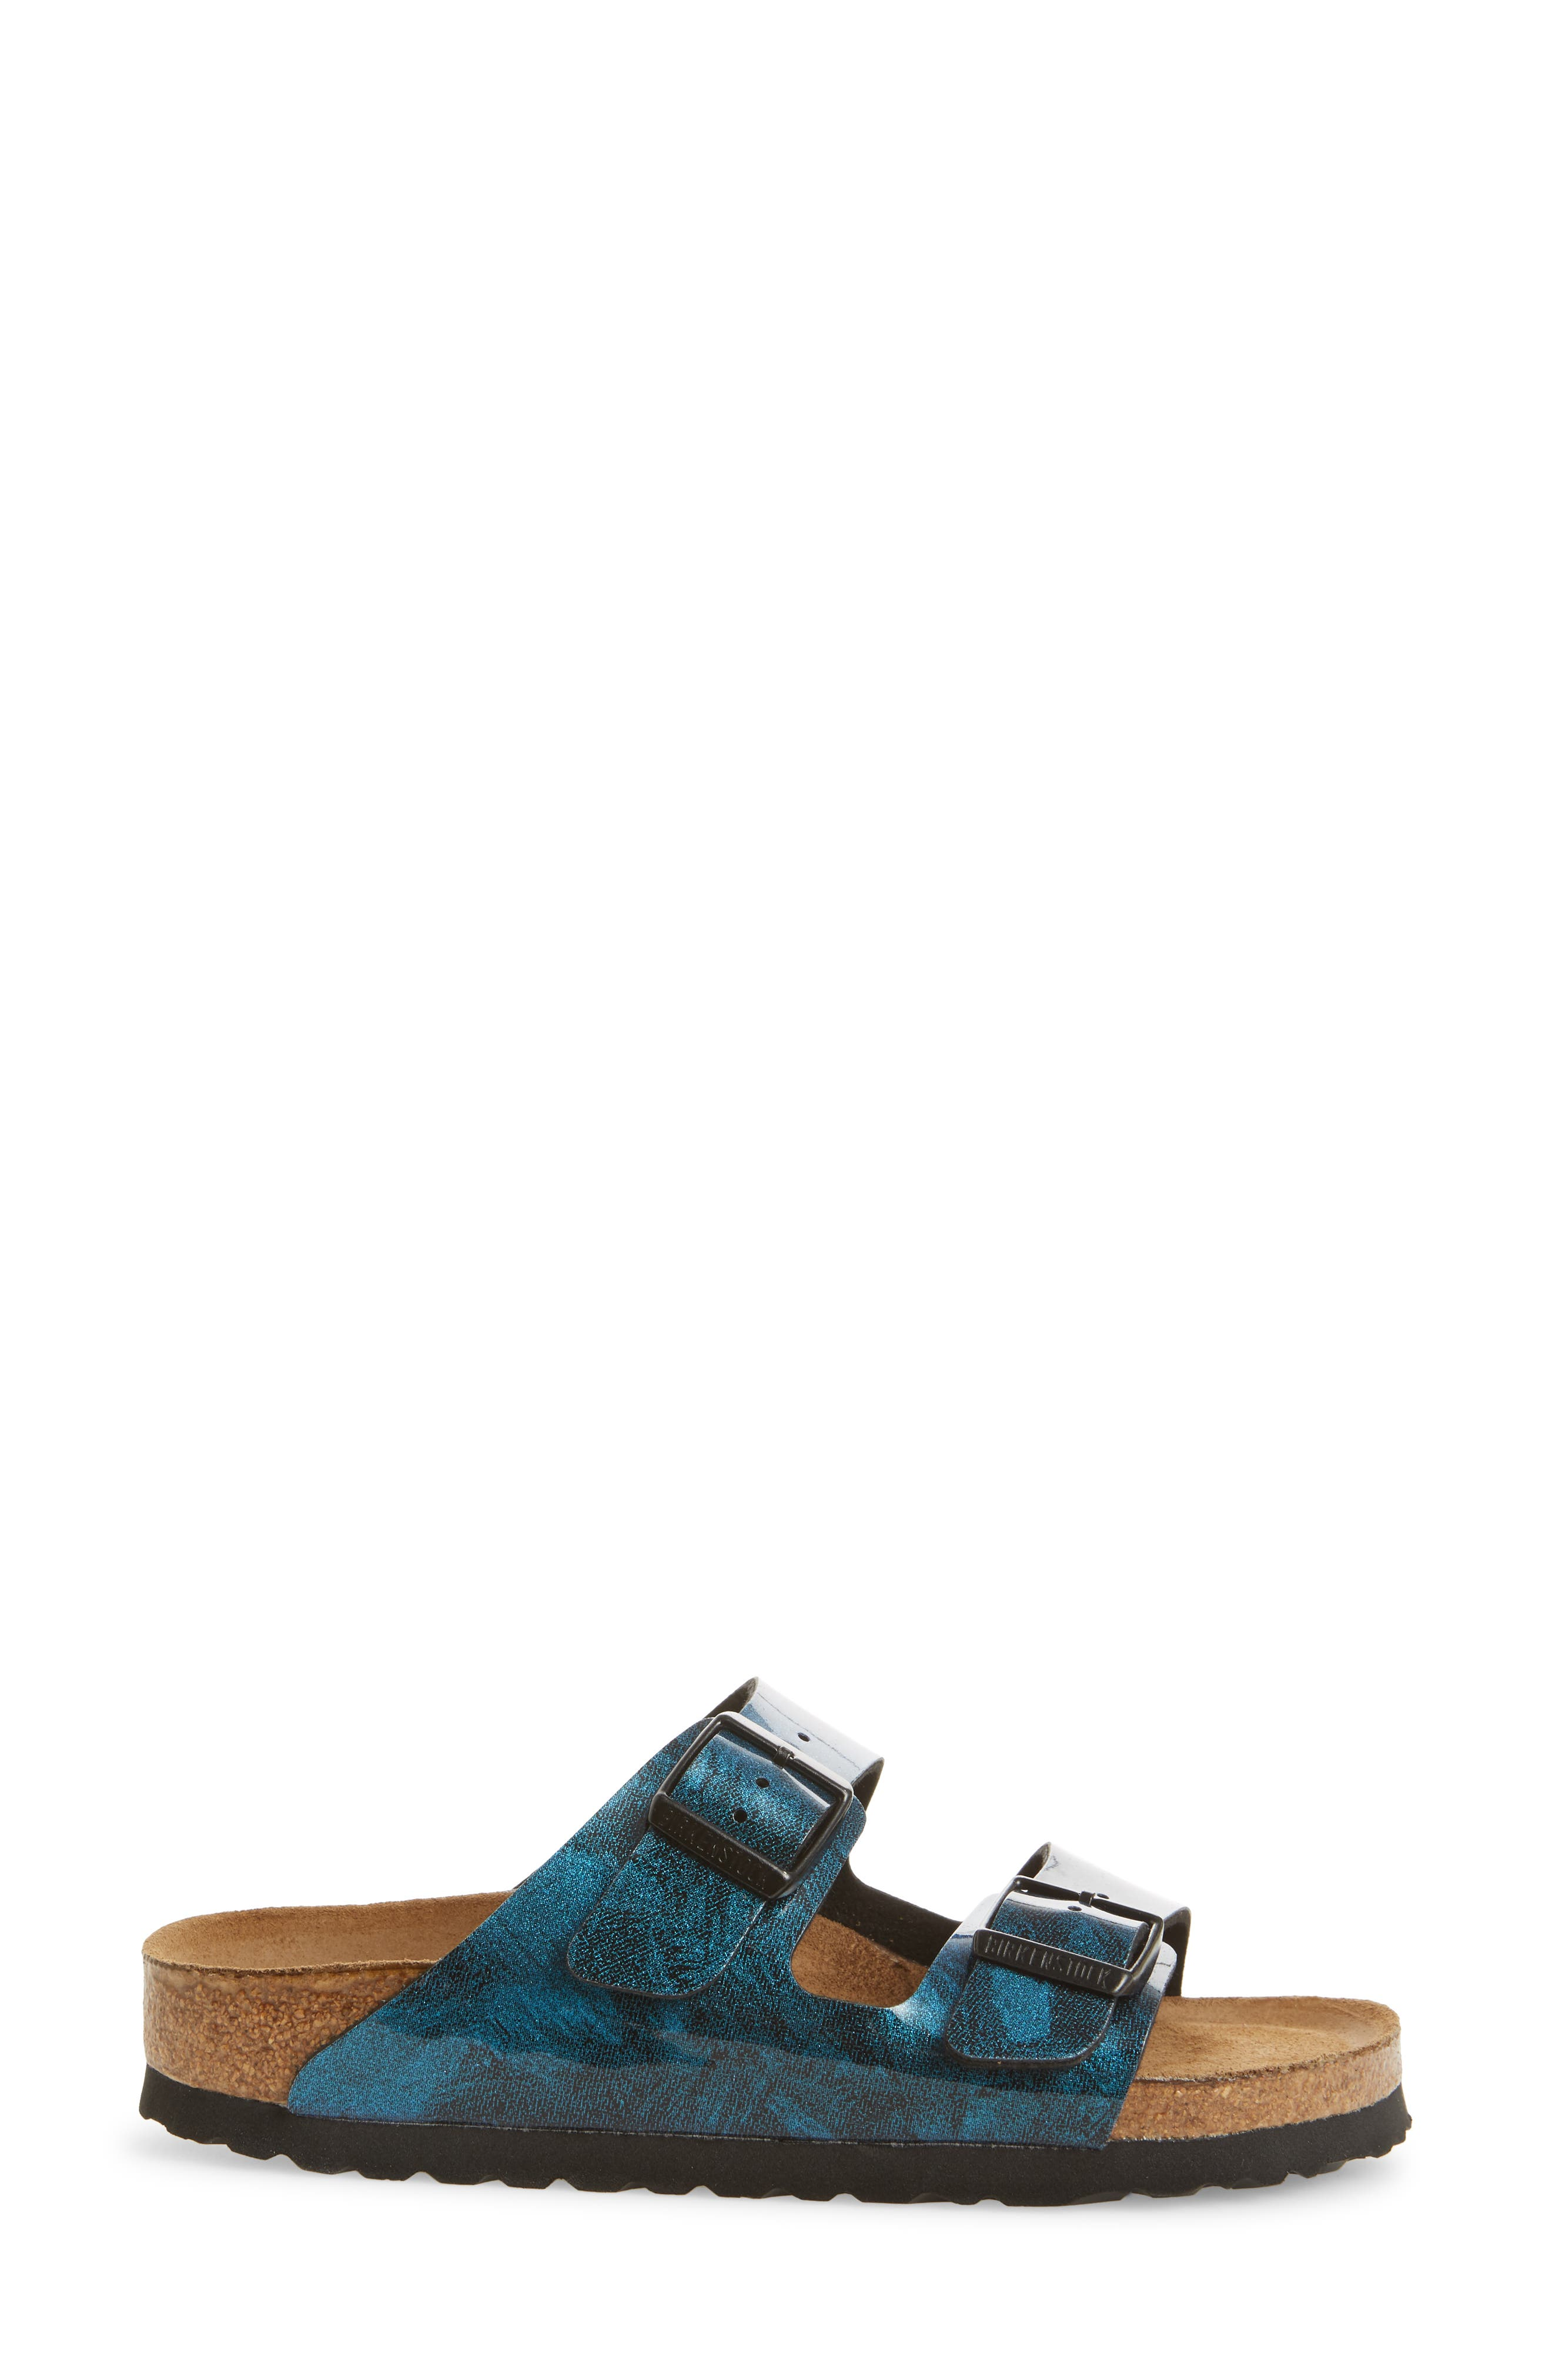 Arizona Birko-Flor Soft Footbed Sandal,                             Alternate thumbnail 3, color,                             MILKY WAY BLUE